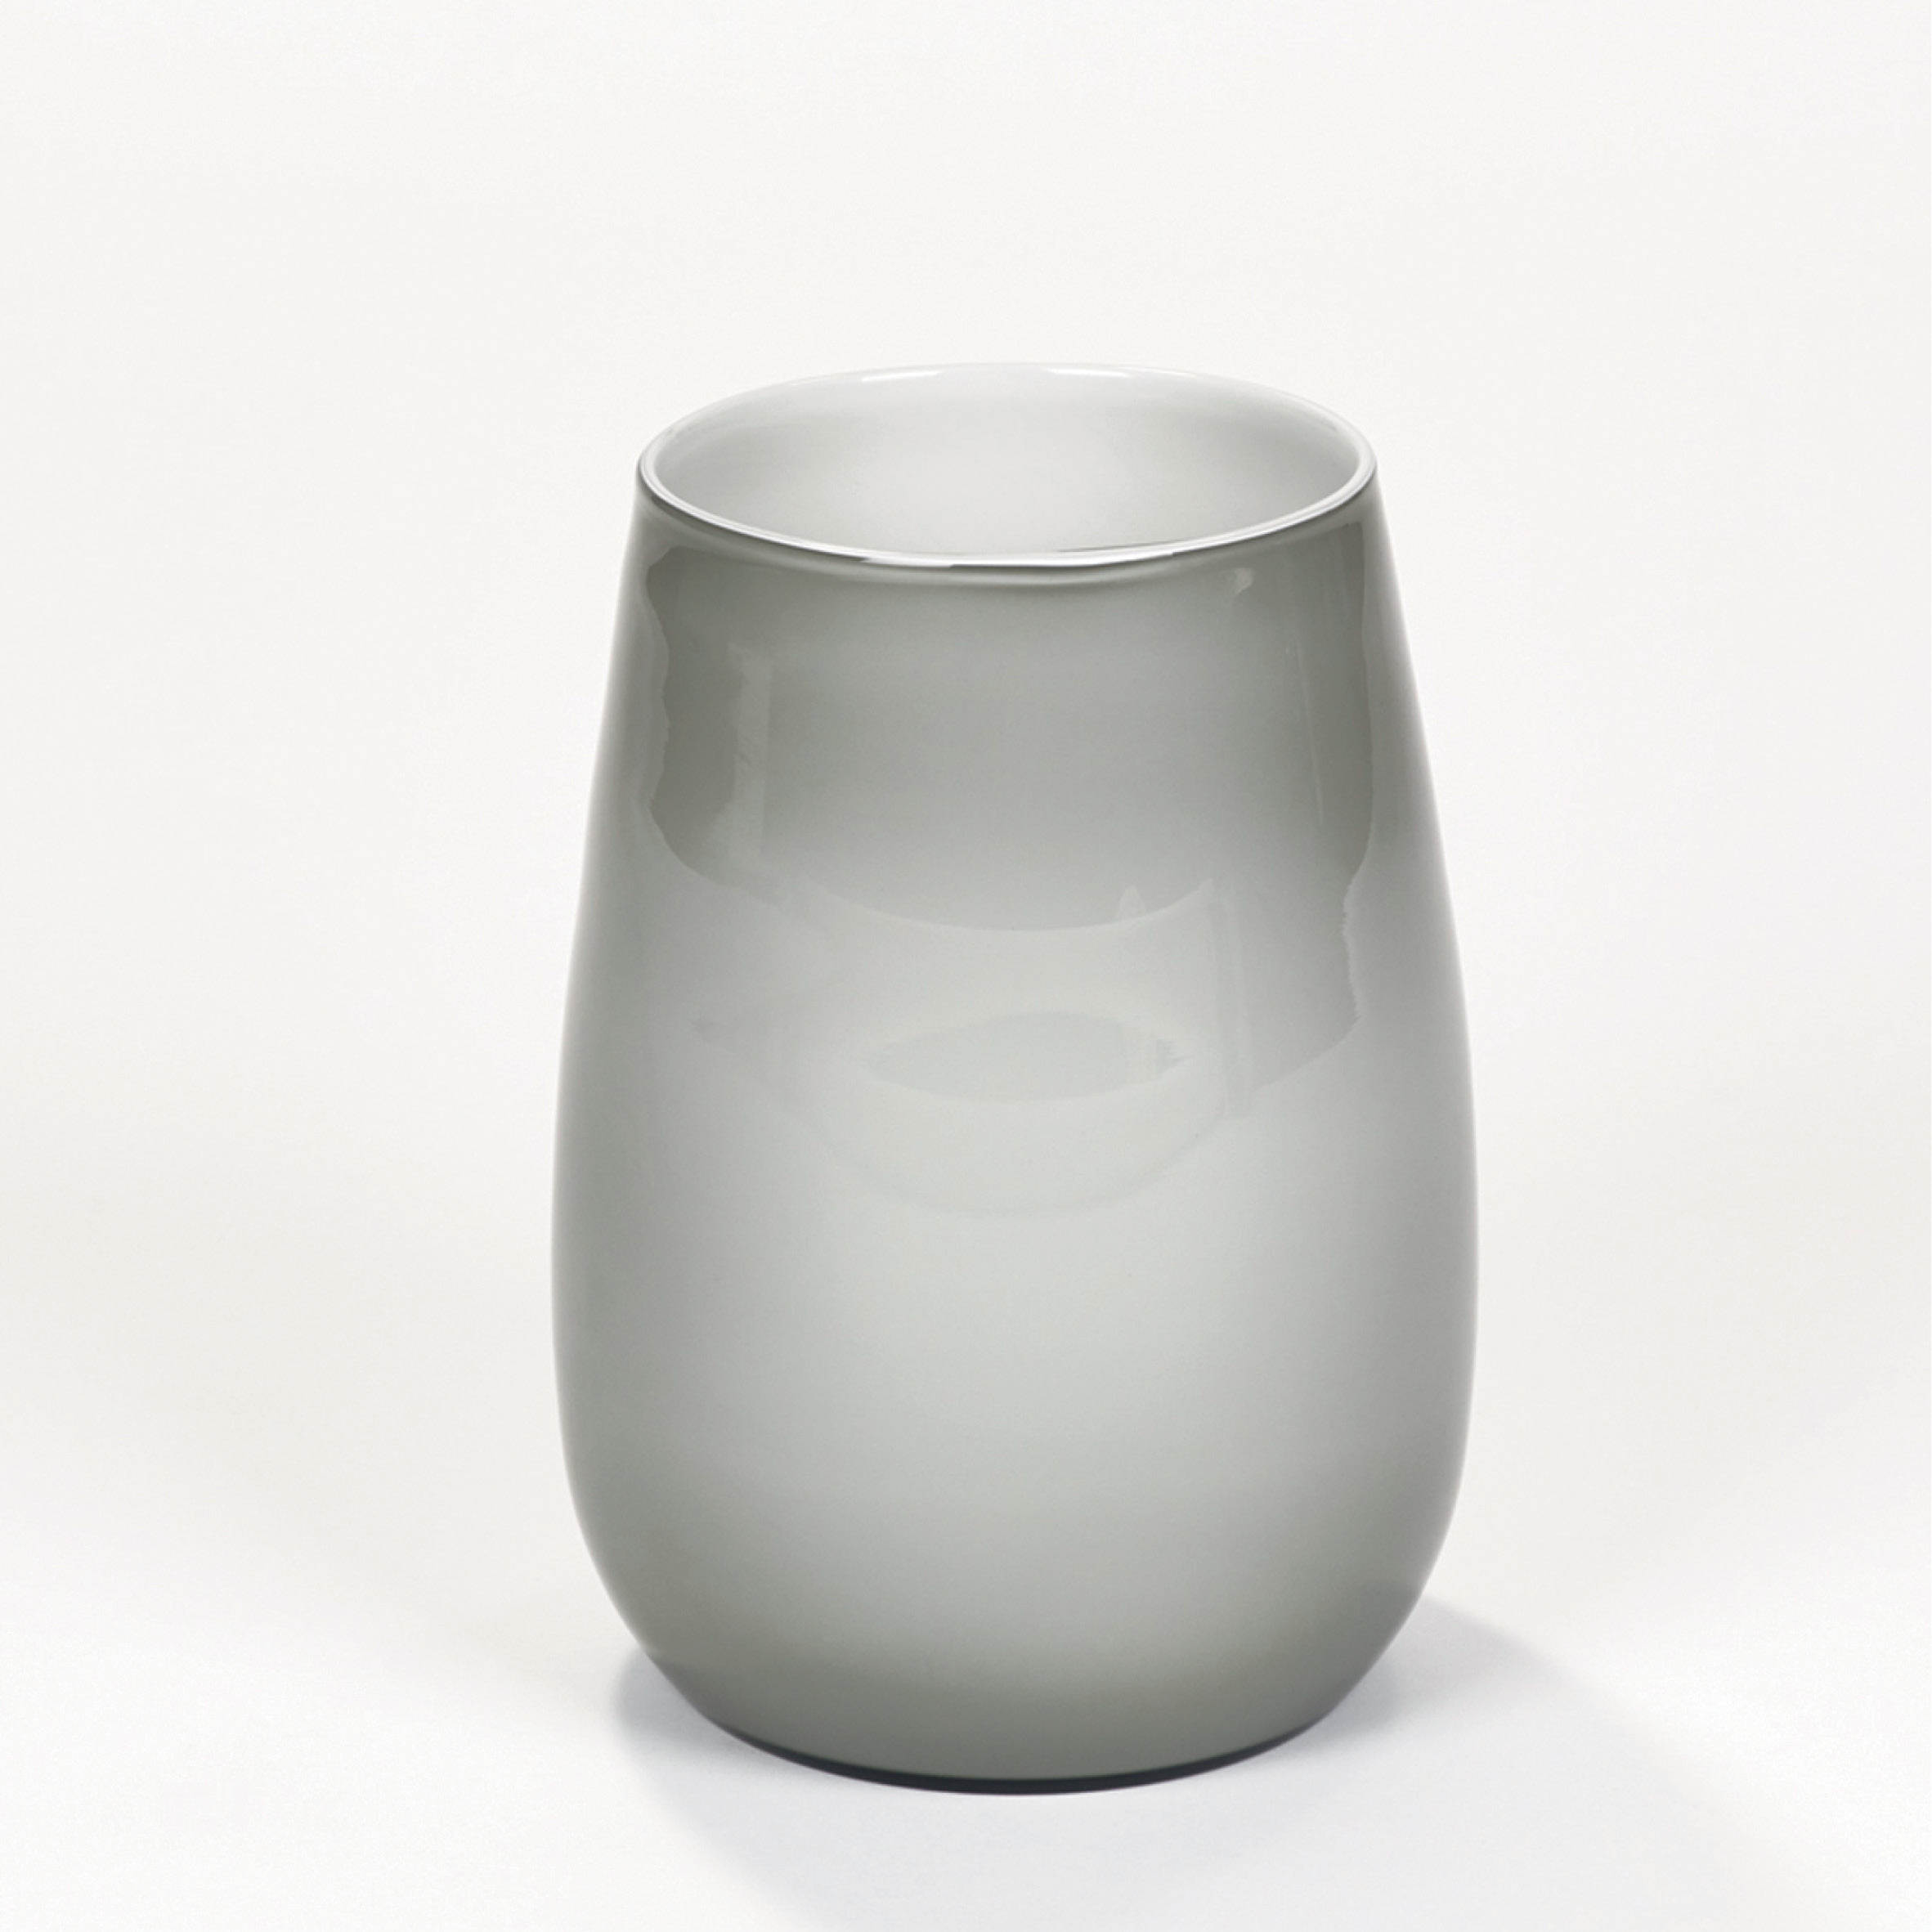 lambert pisano vase platin gro lambert querpass shop. Black Bedroom Furniture Sets. Home Design Ideas